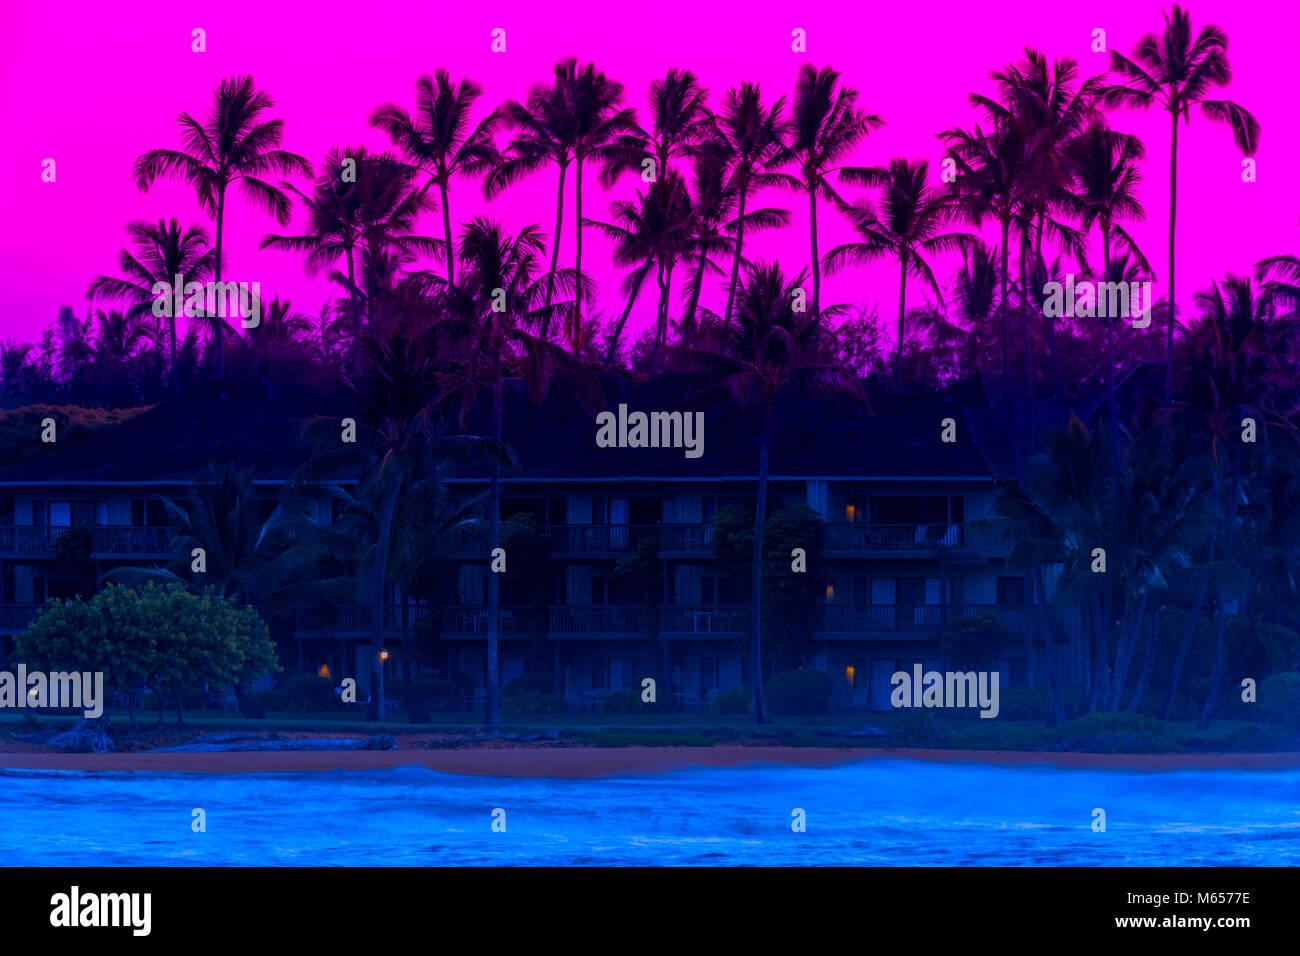 Condominiums on Kauai, Hawaii Stock Photo